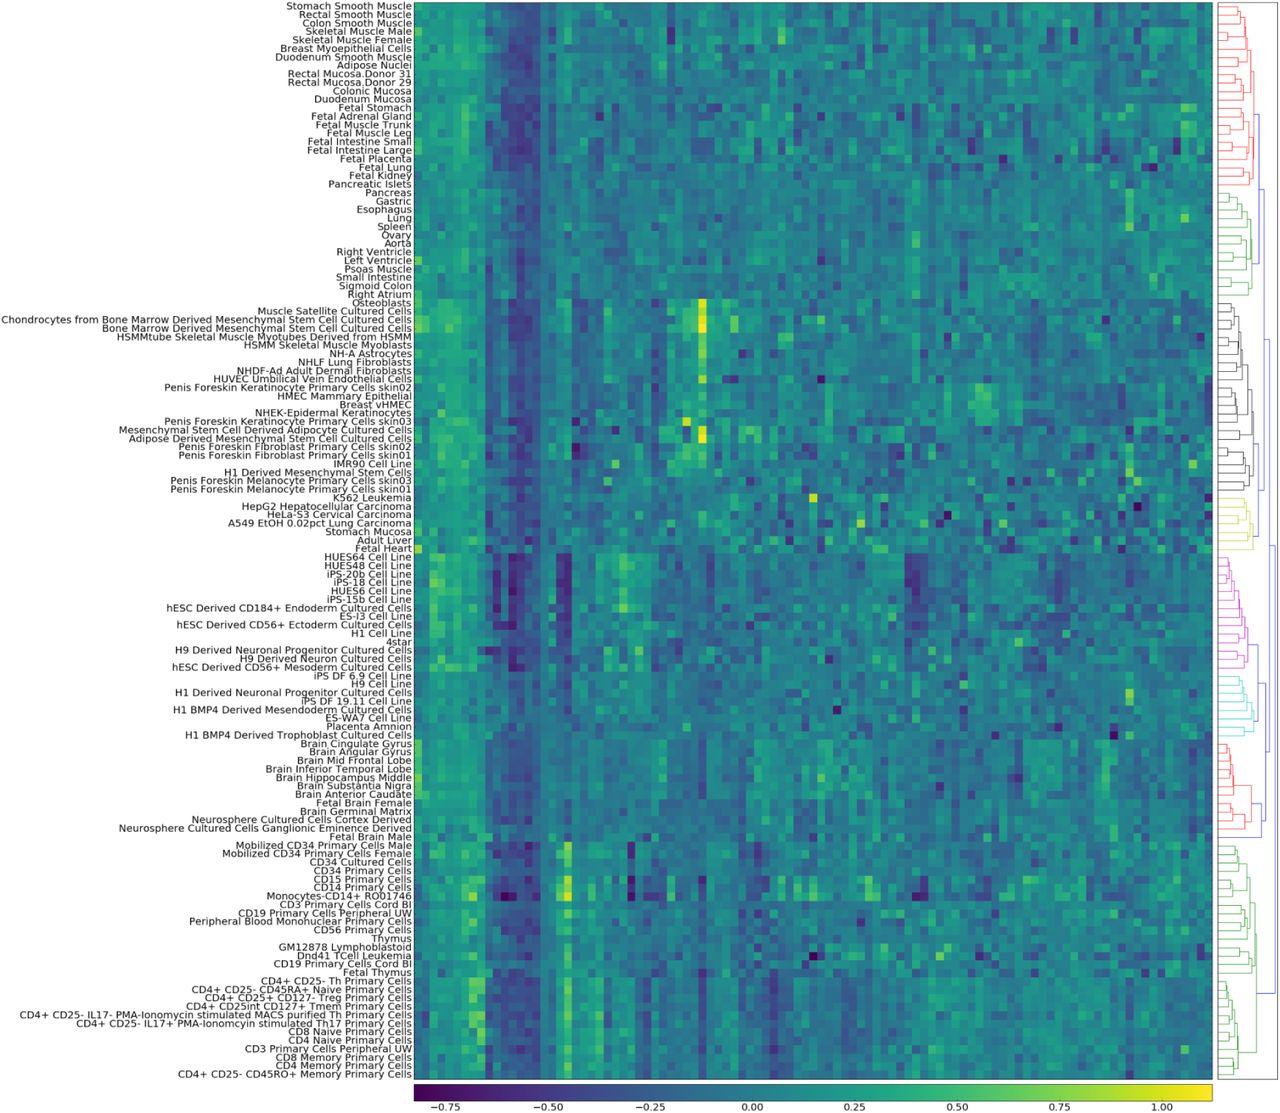 PREDICTD: PaRallel Epigenomics Data Imputation with Cloud